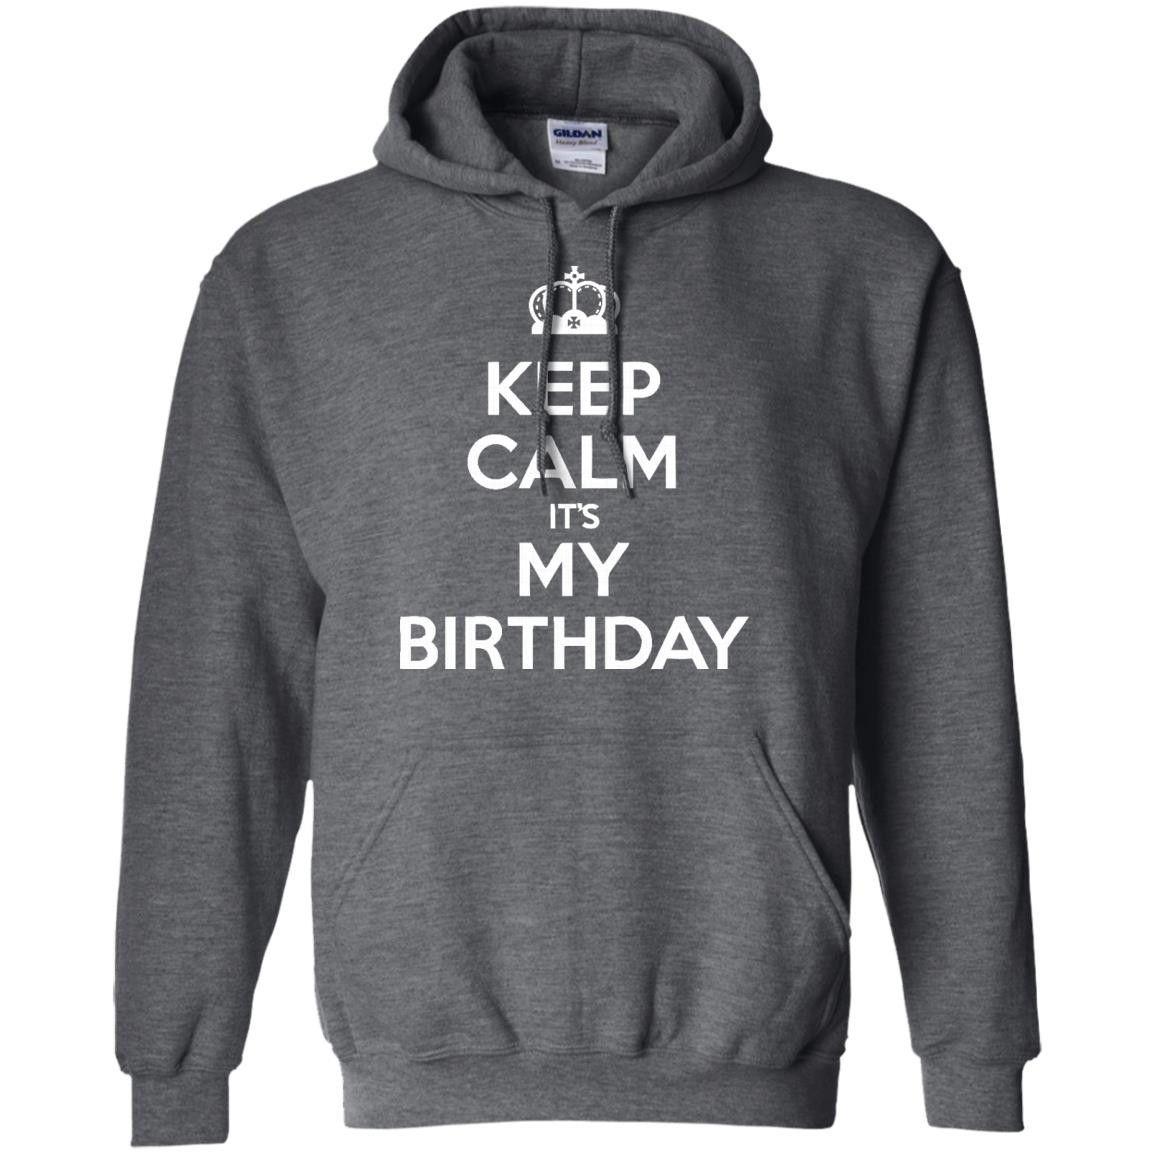 Keep Calm It's My Birthday-01 G185 Gildan Pullover Hoodie